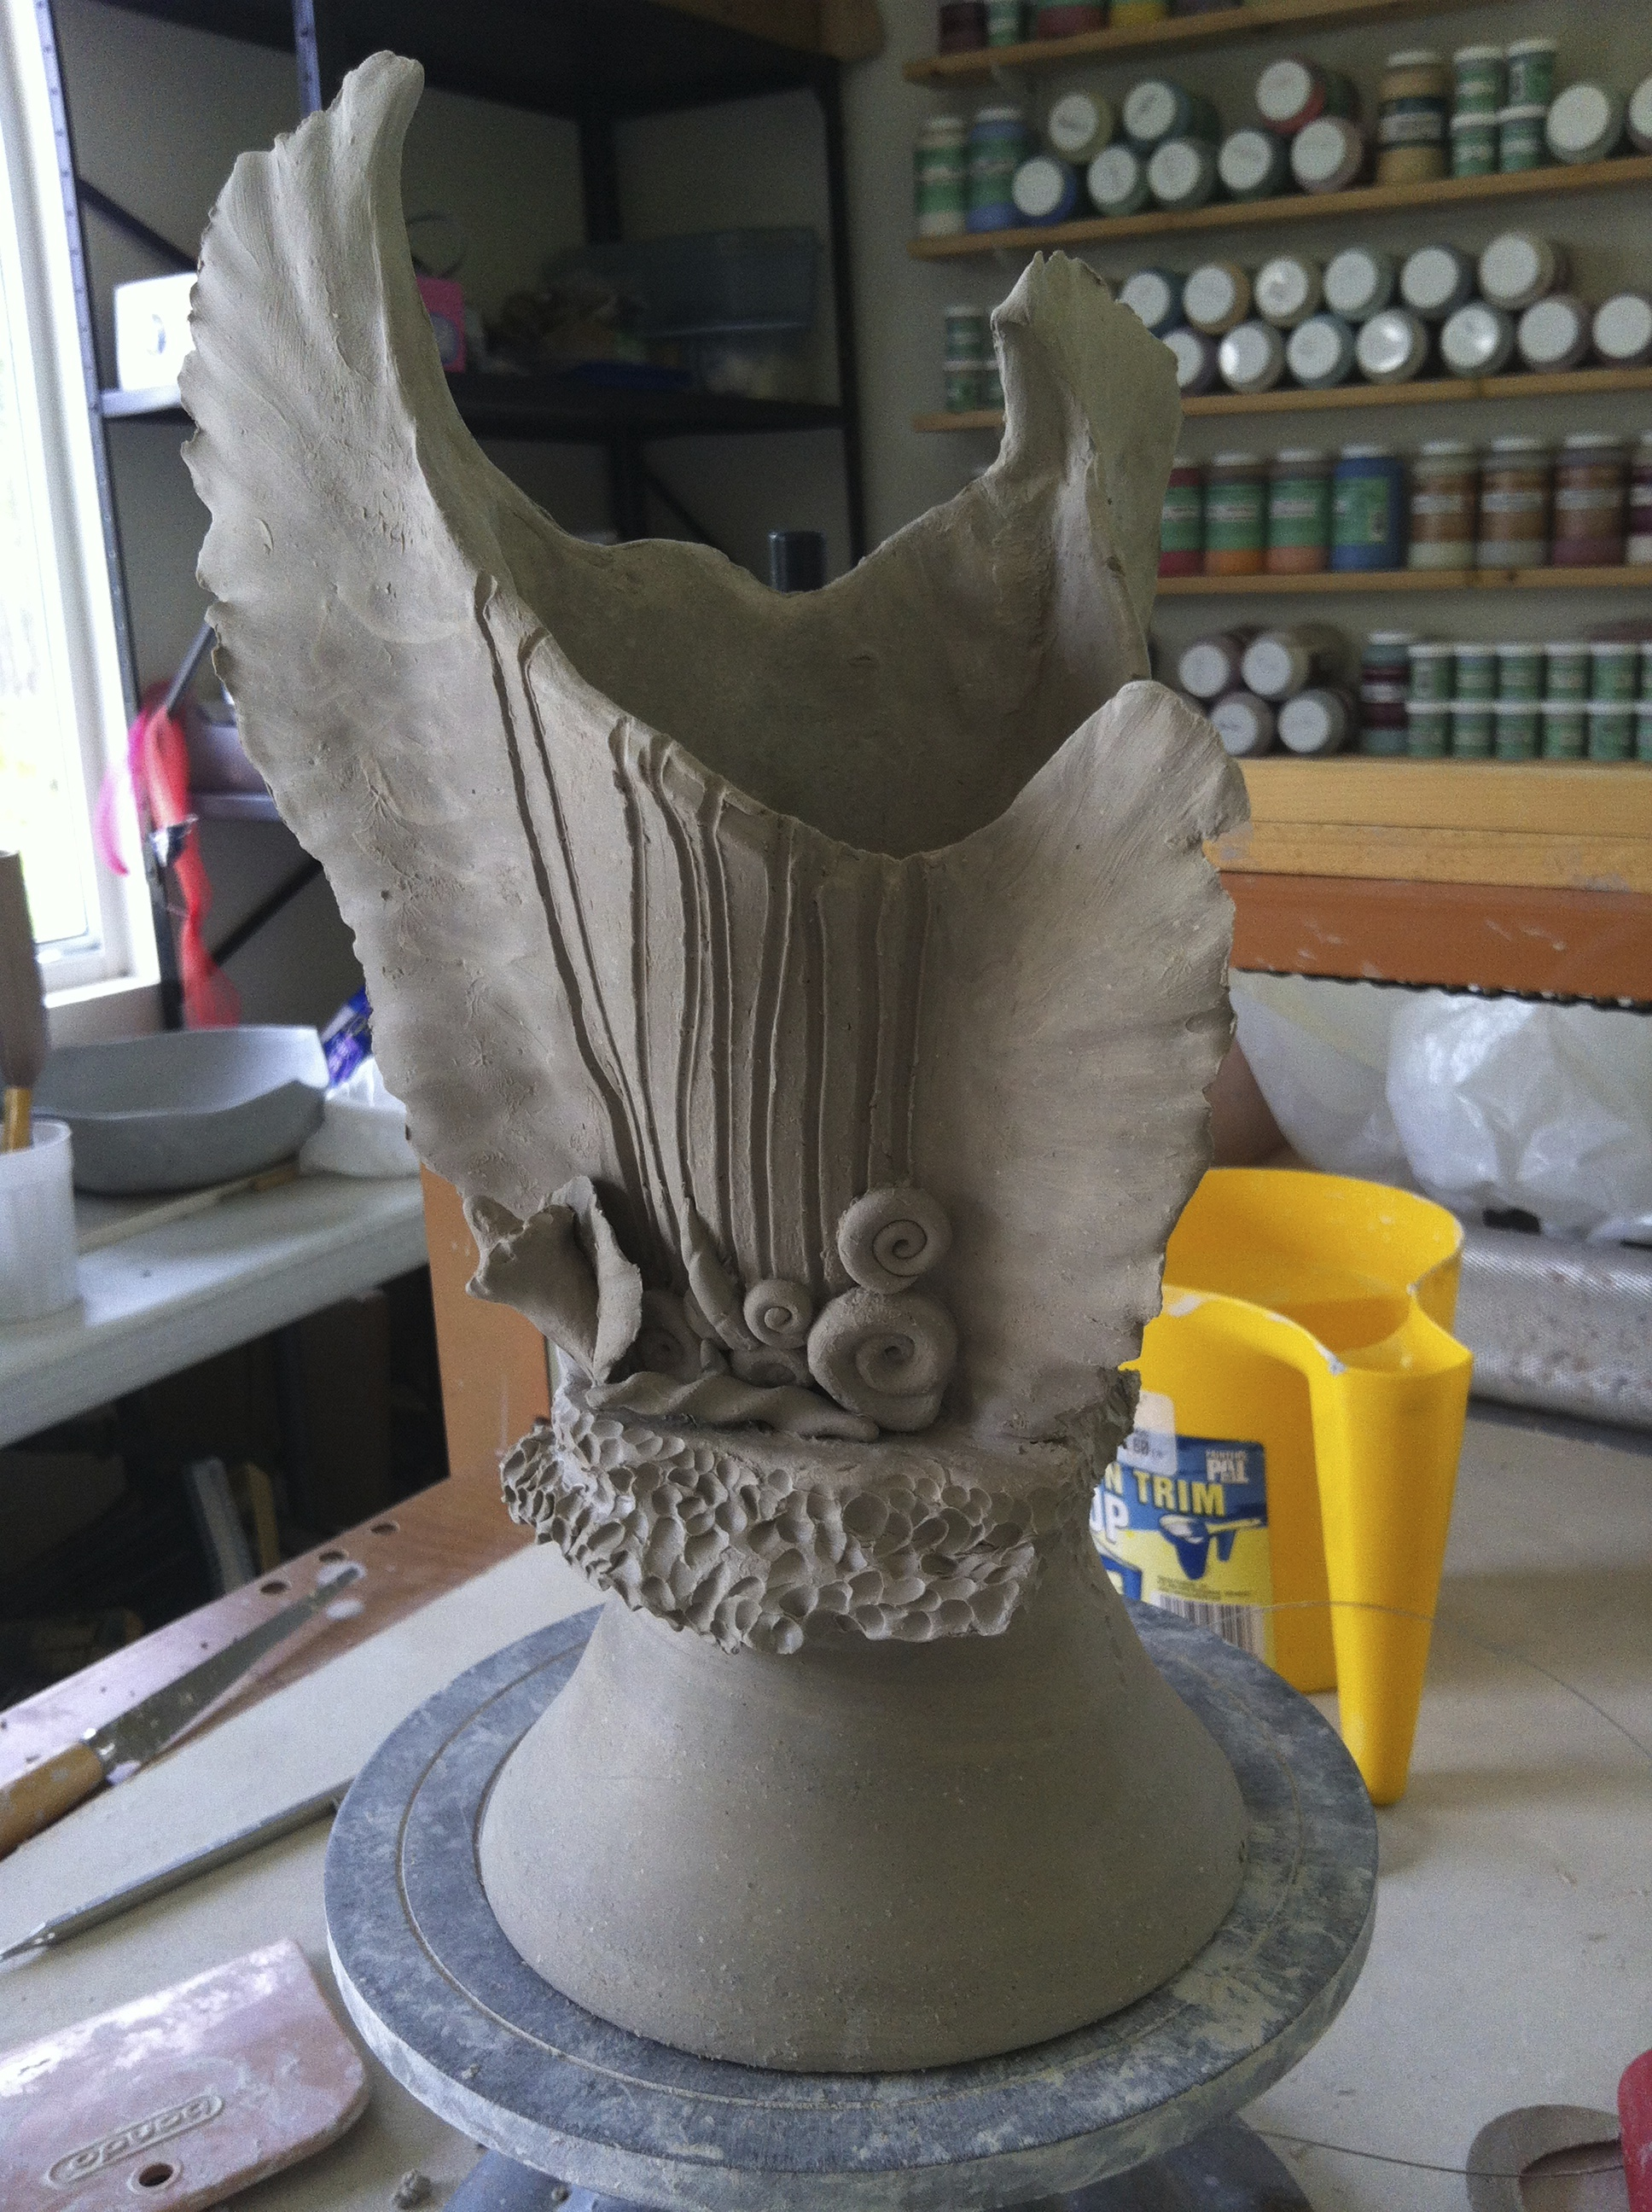 Wheel thrown and handbuilt vase in progress.